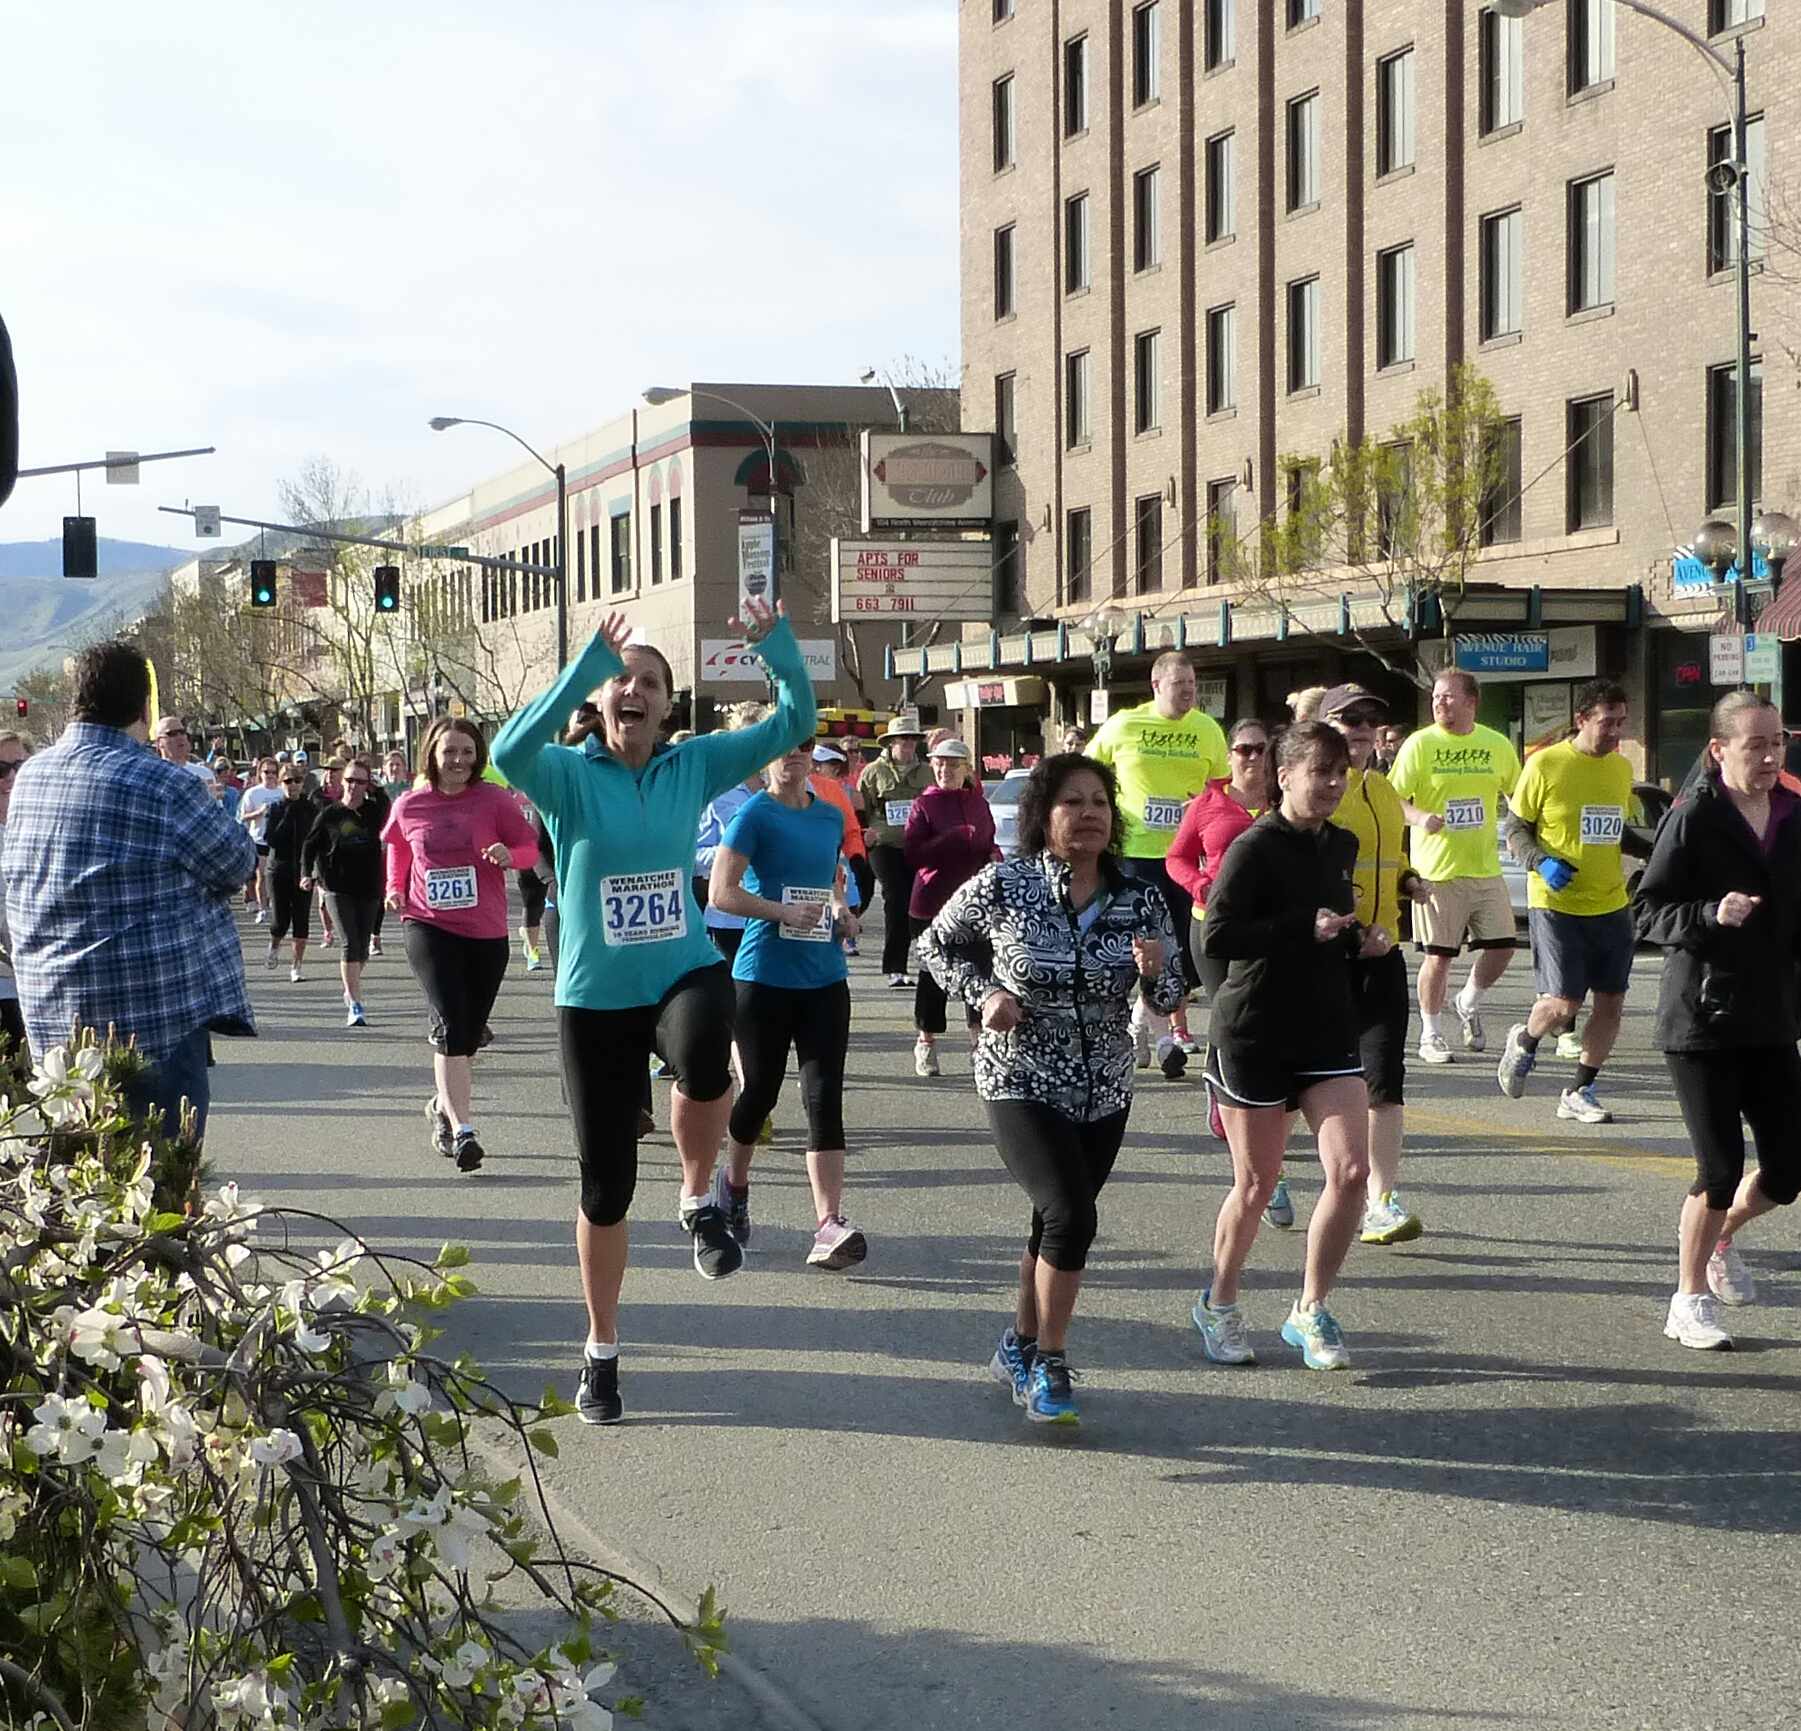 This blogger's enthusiastic start at the Wenatchee Marathon 10K!